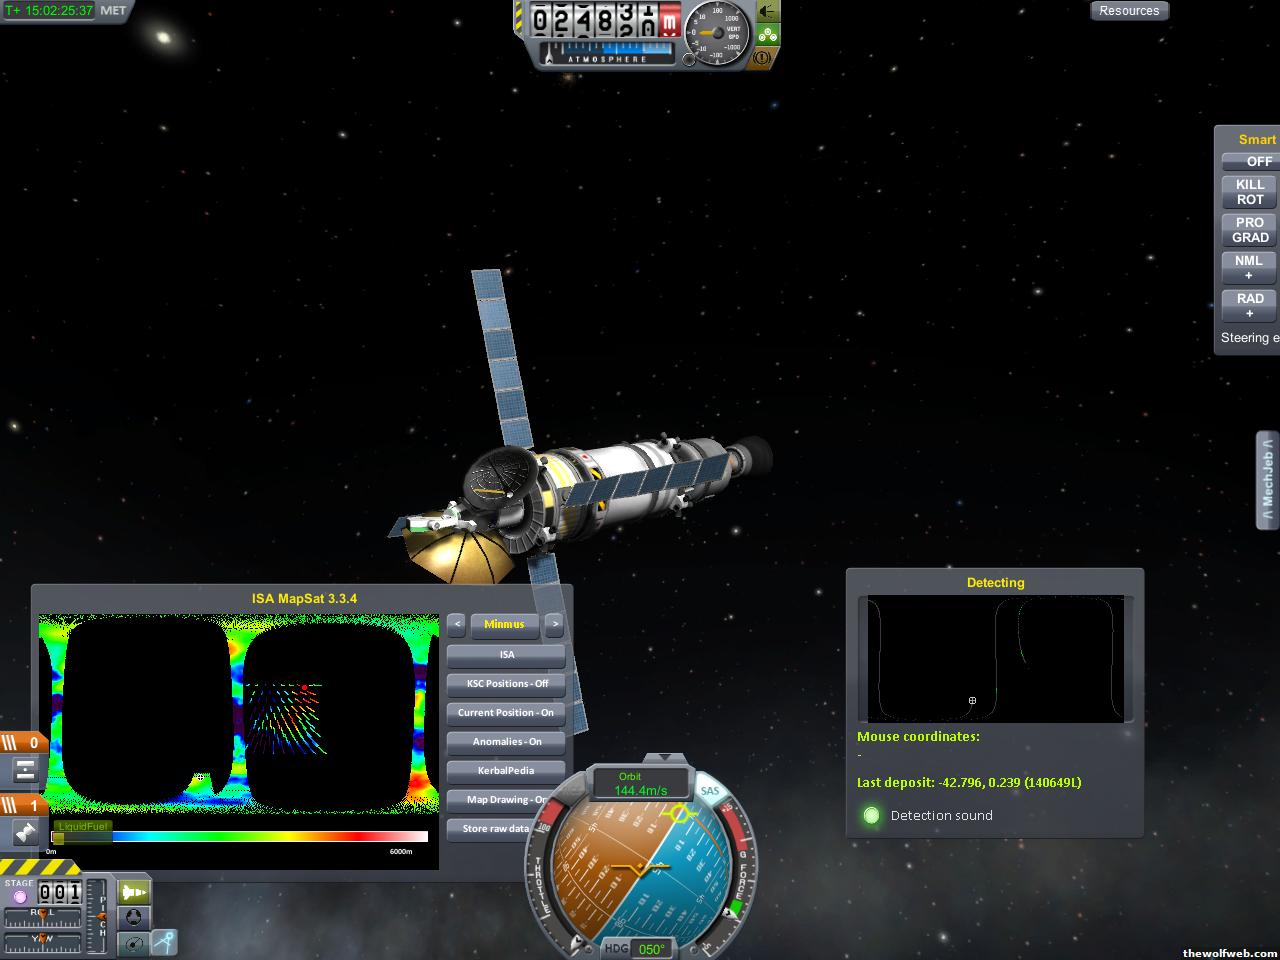 TWW - Kerbal Space Program